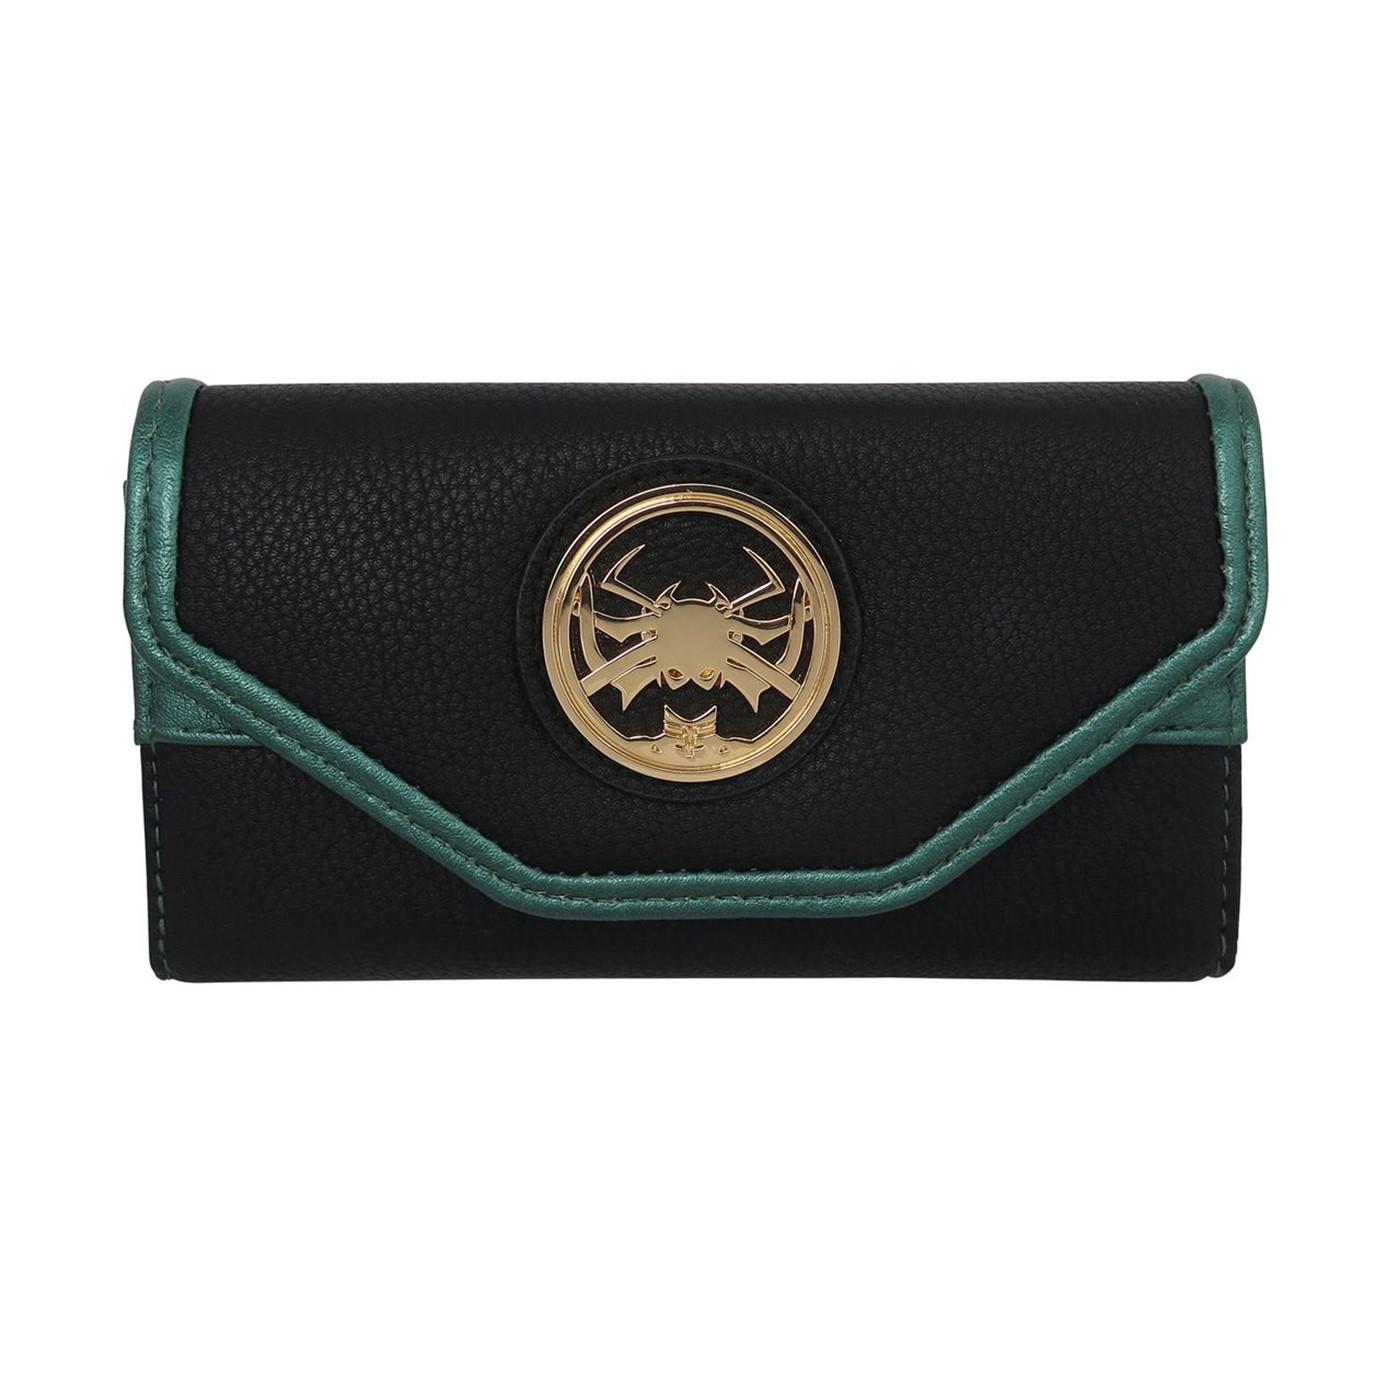 Thor Hela Women's Flap Wallet